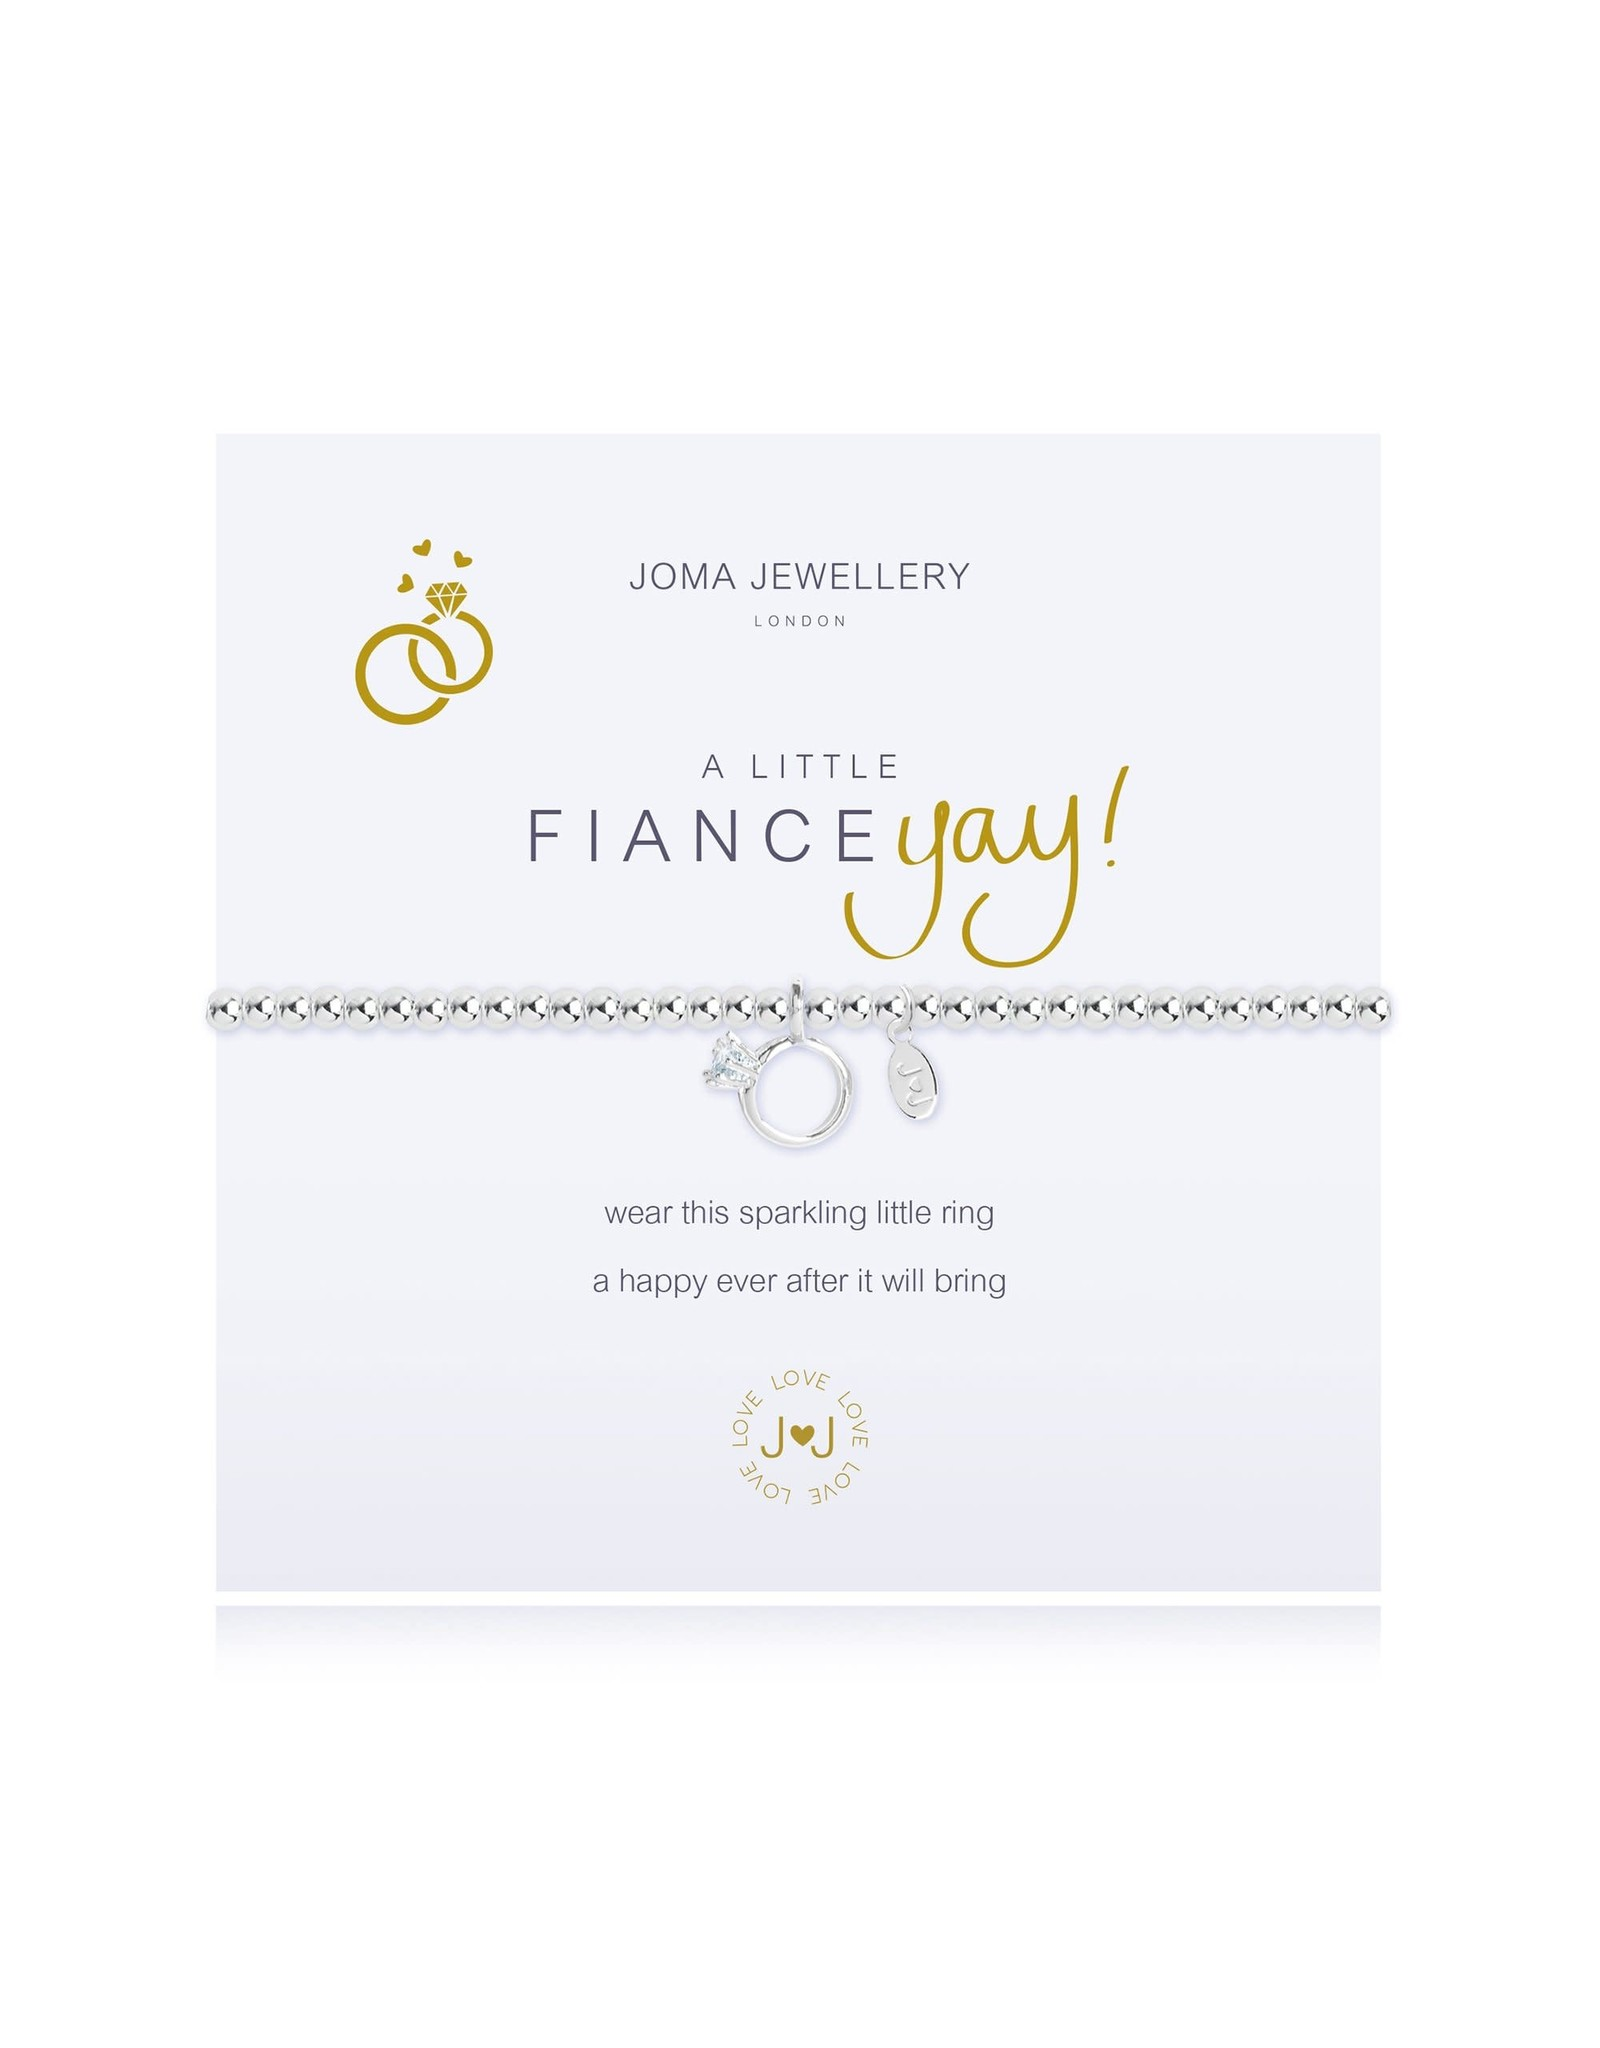 Joma Jewellery A Little - Fiance-Yay!